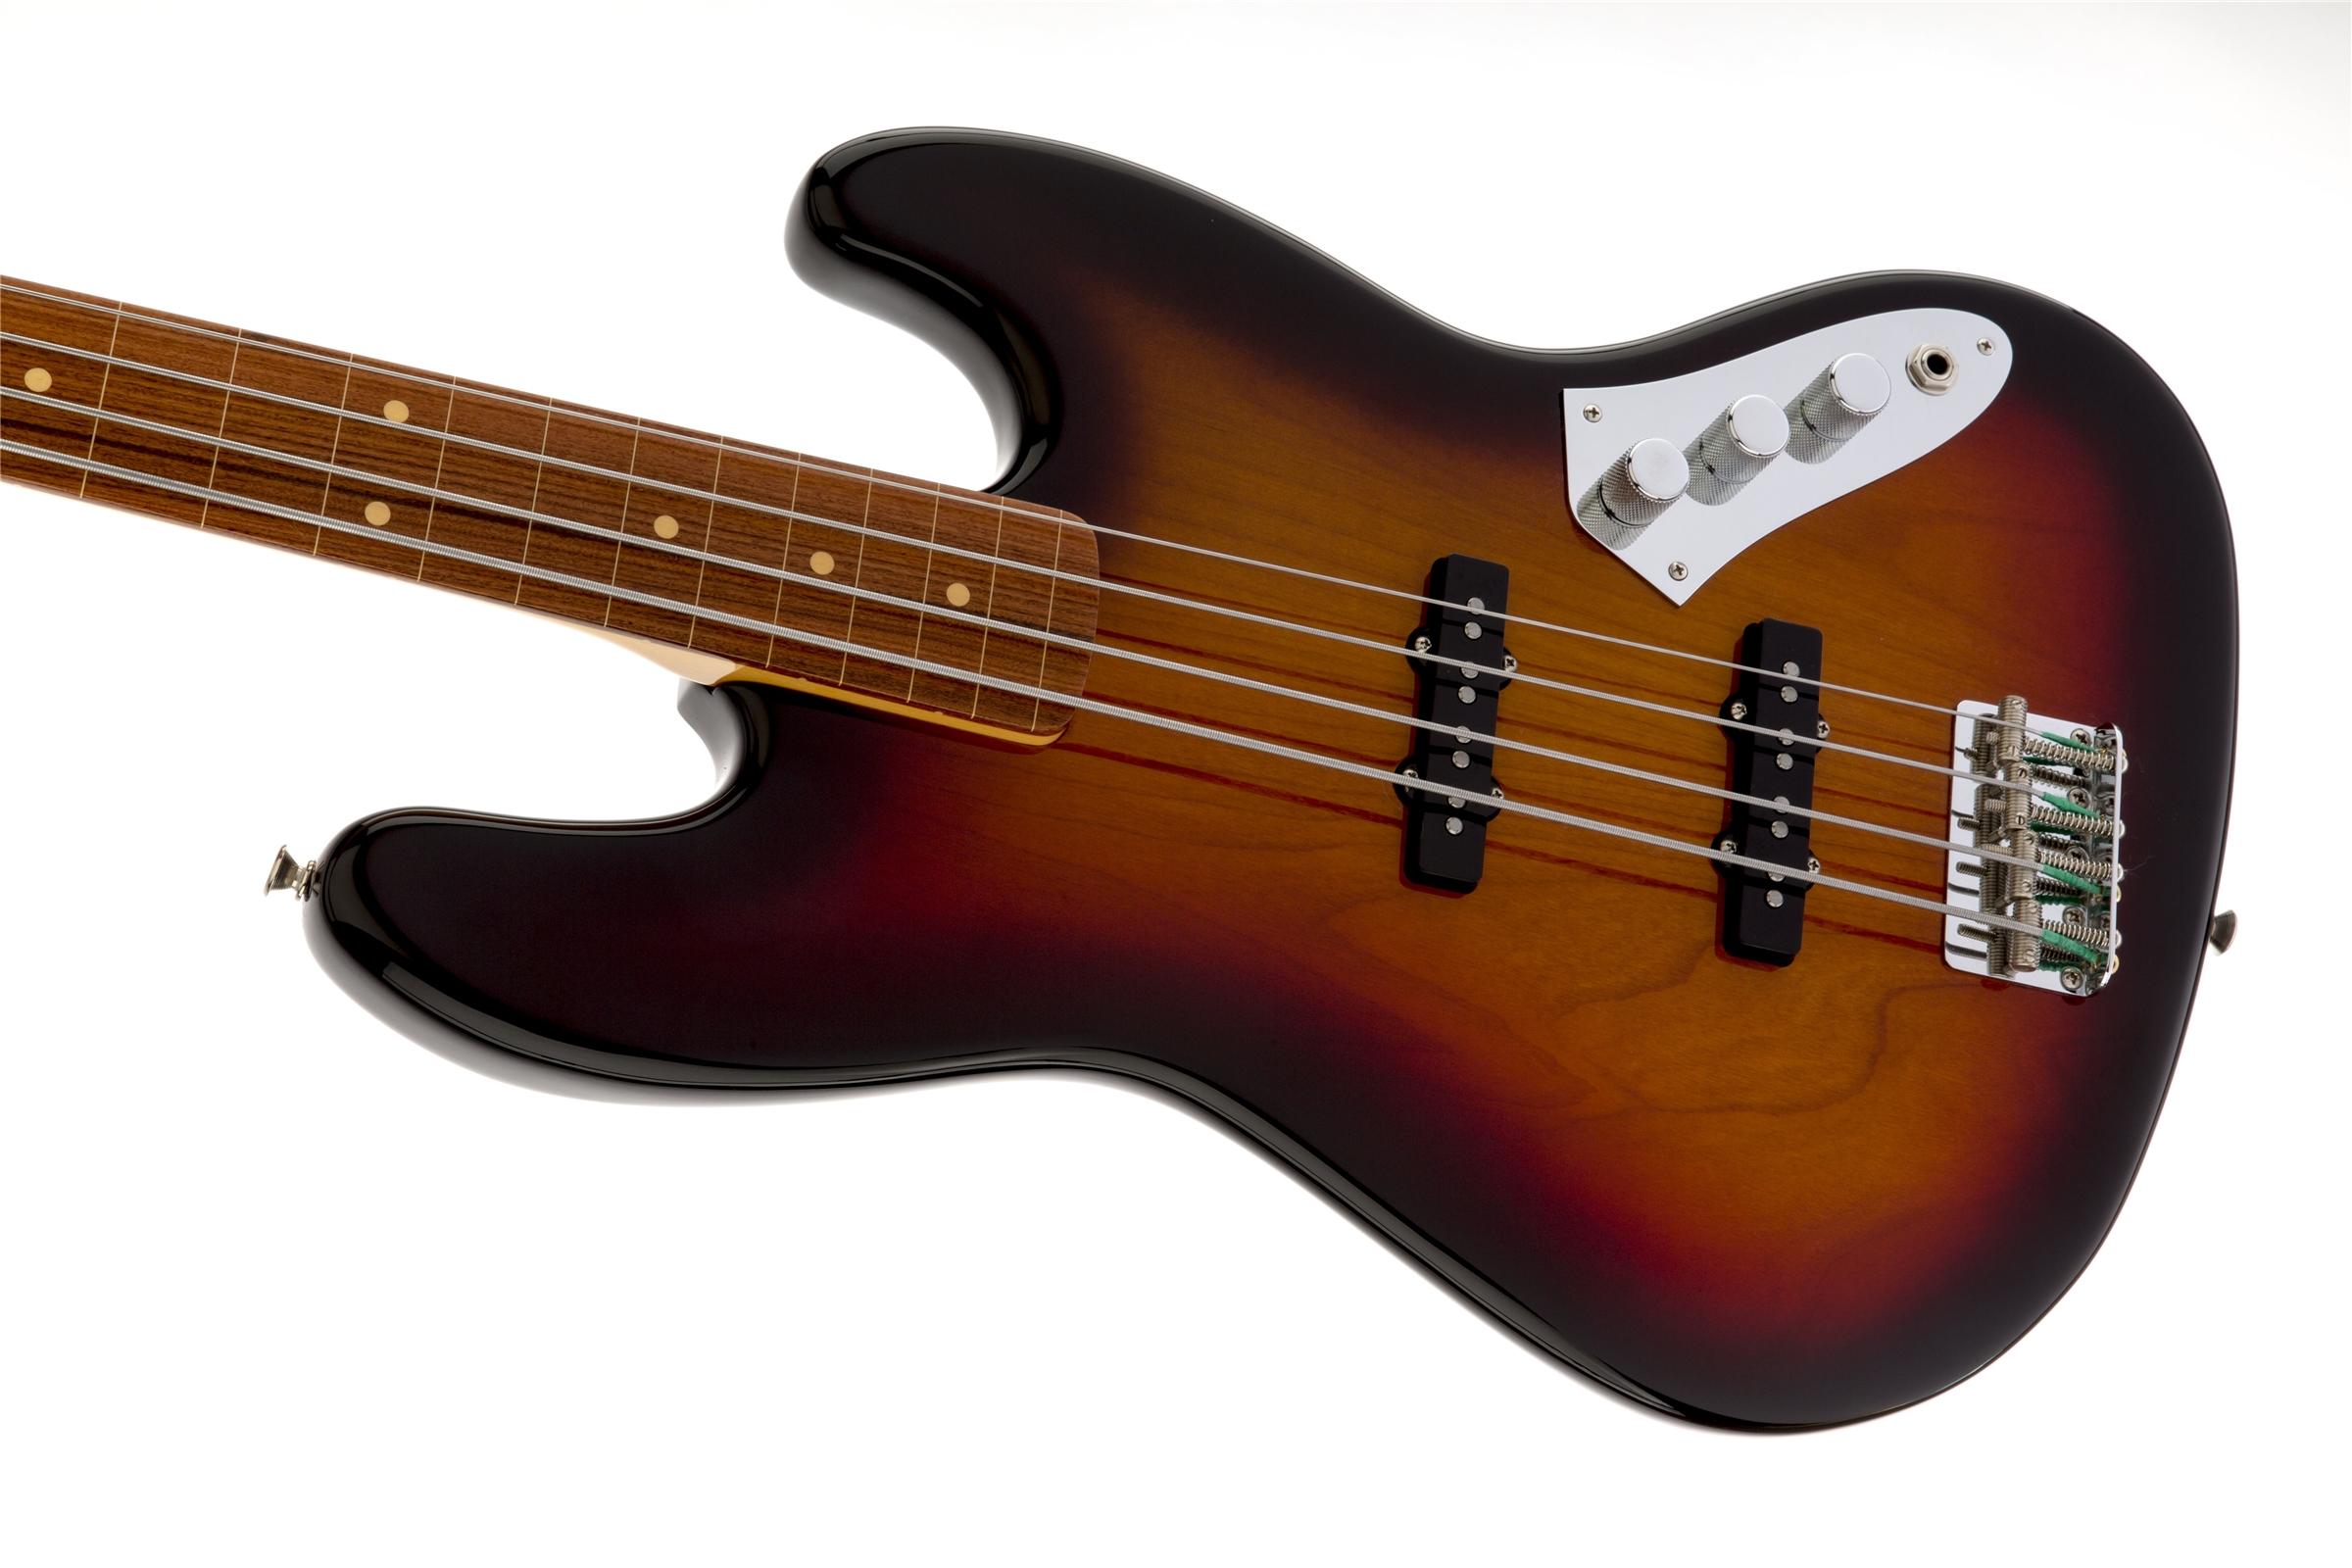 Jaco J Bass Wiring Diagram And Ebooks Samick Pastorius Jazz Electric Basses Rh Shop Fender Com Squier